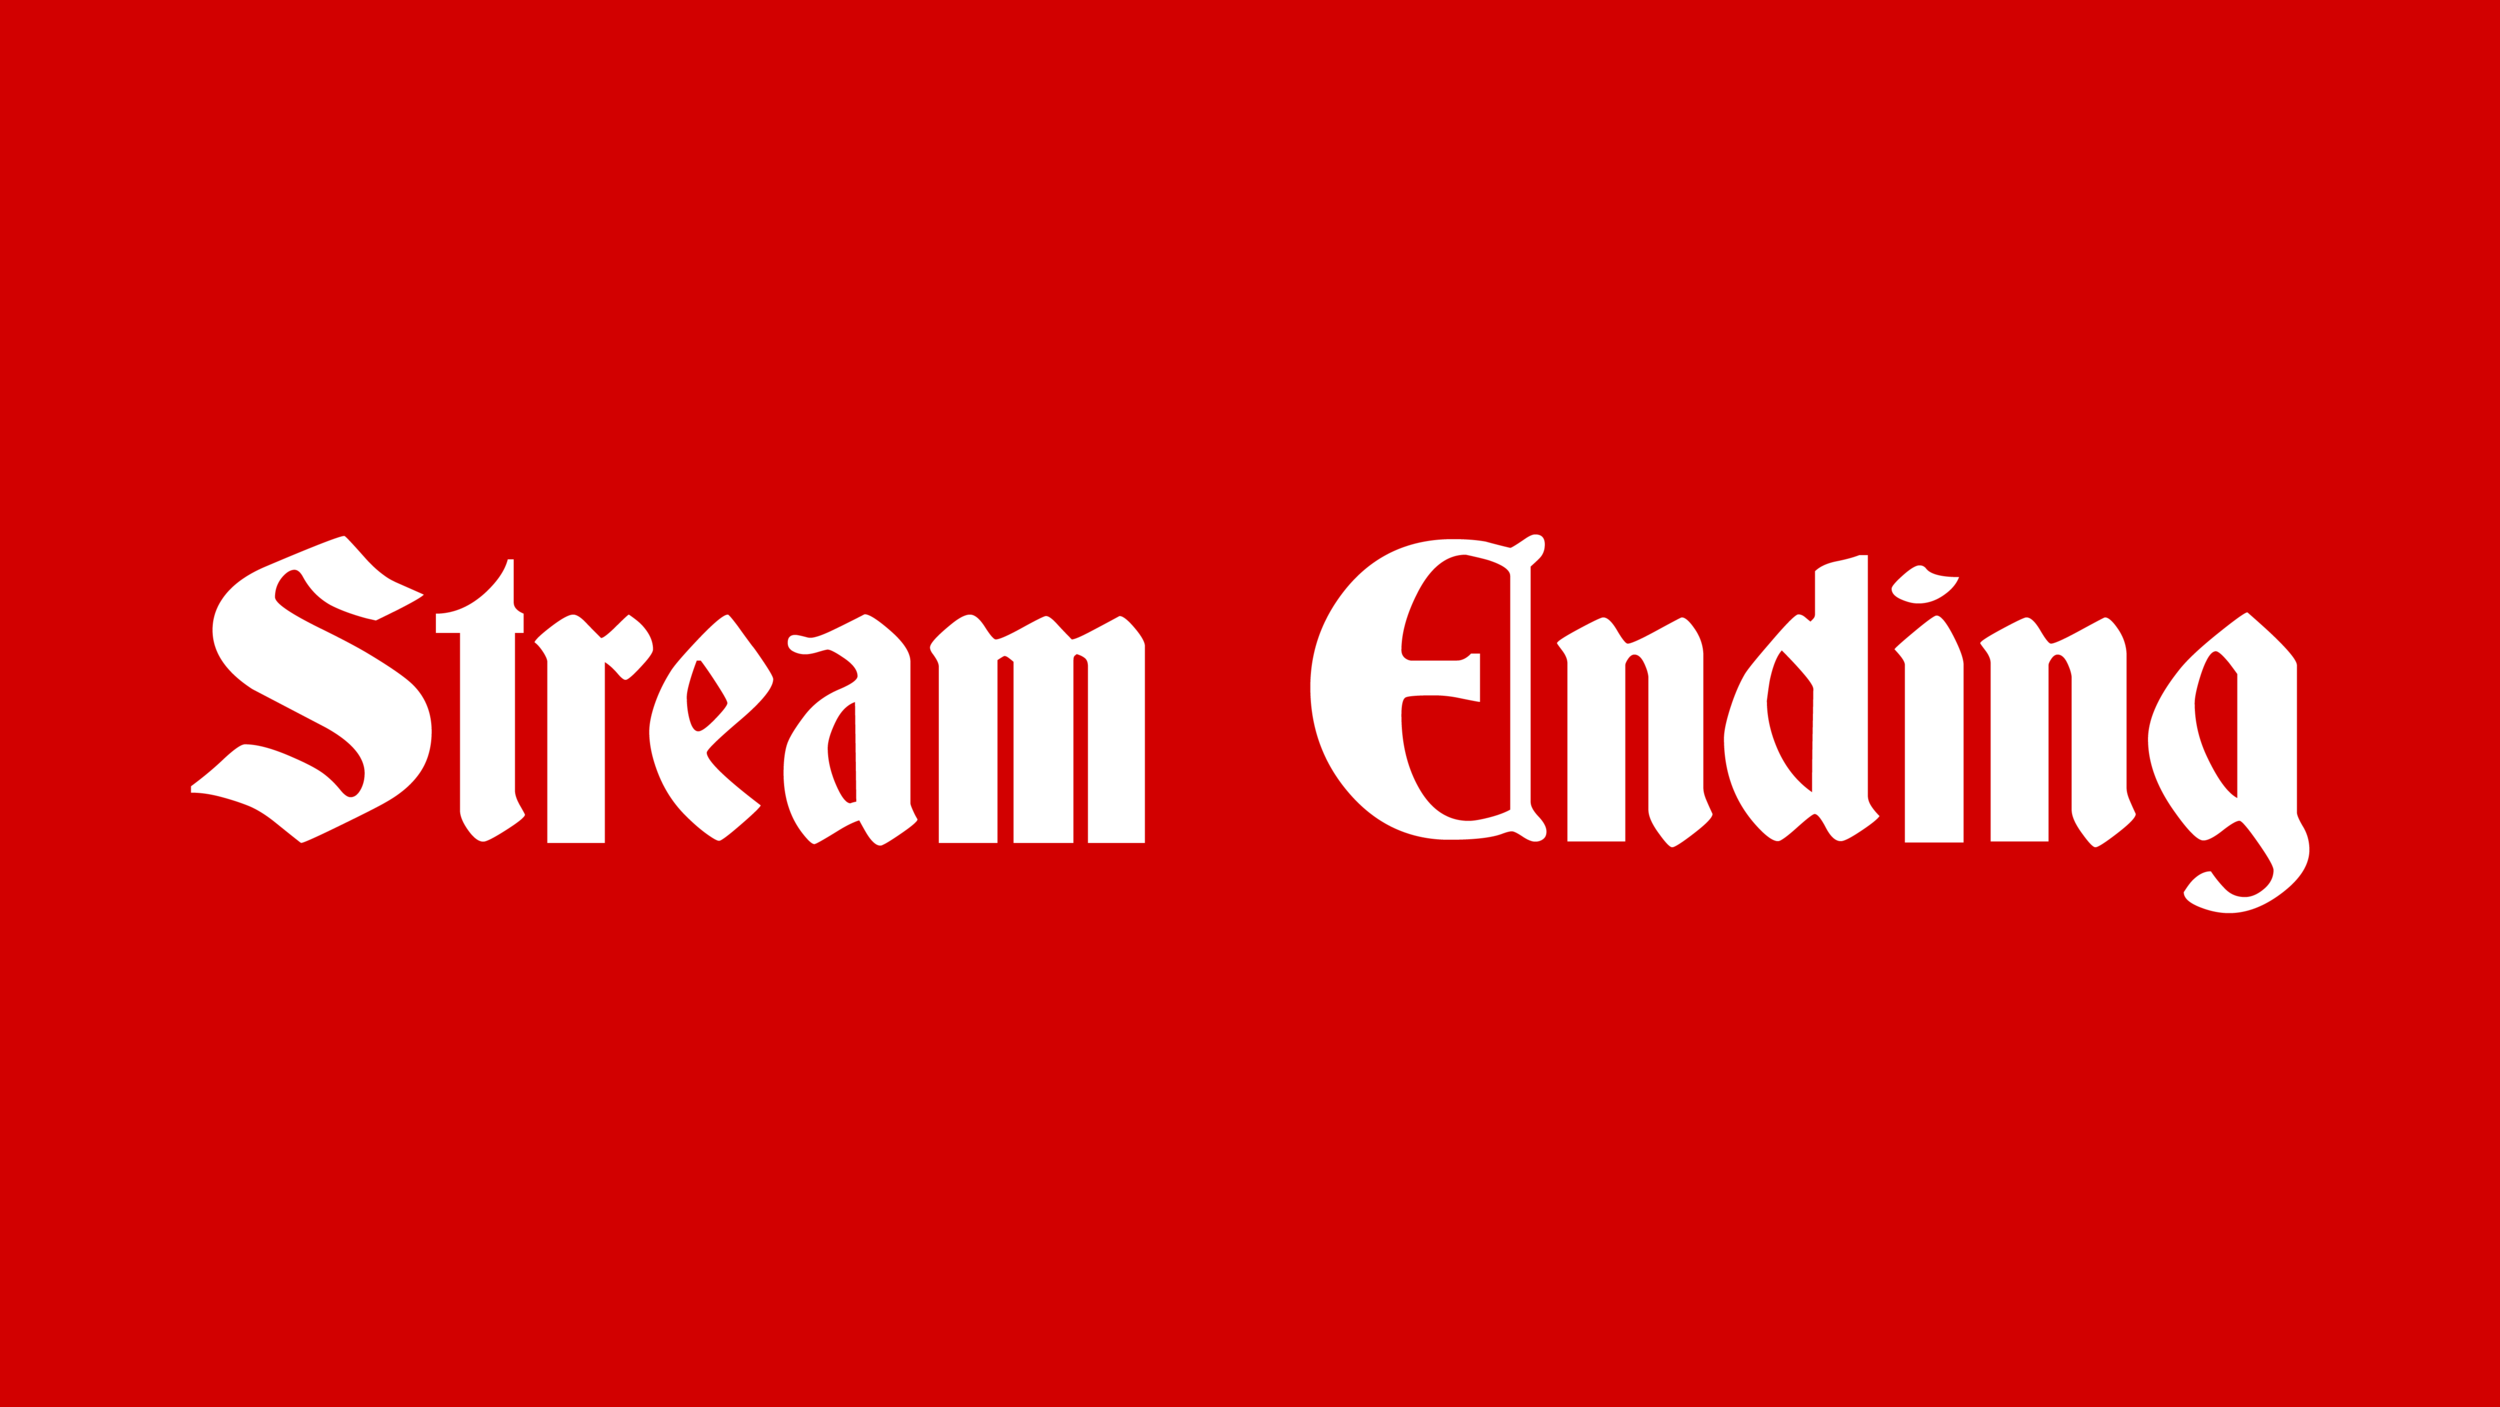 Madknight64_Branding_VG_Stream Ending.png